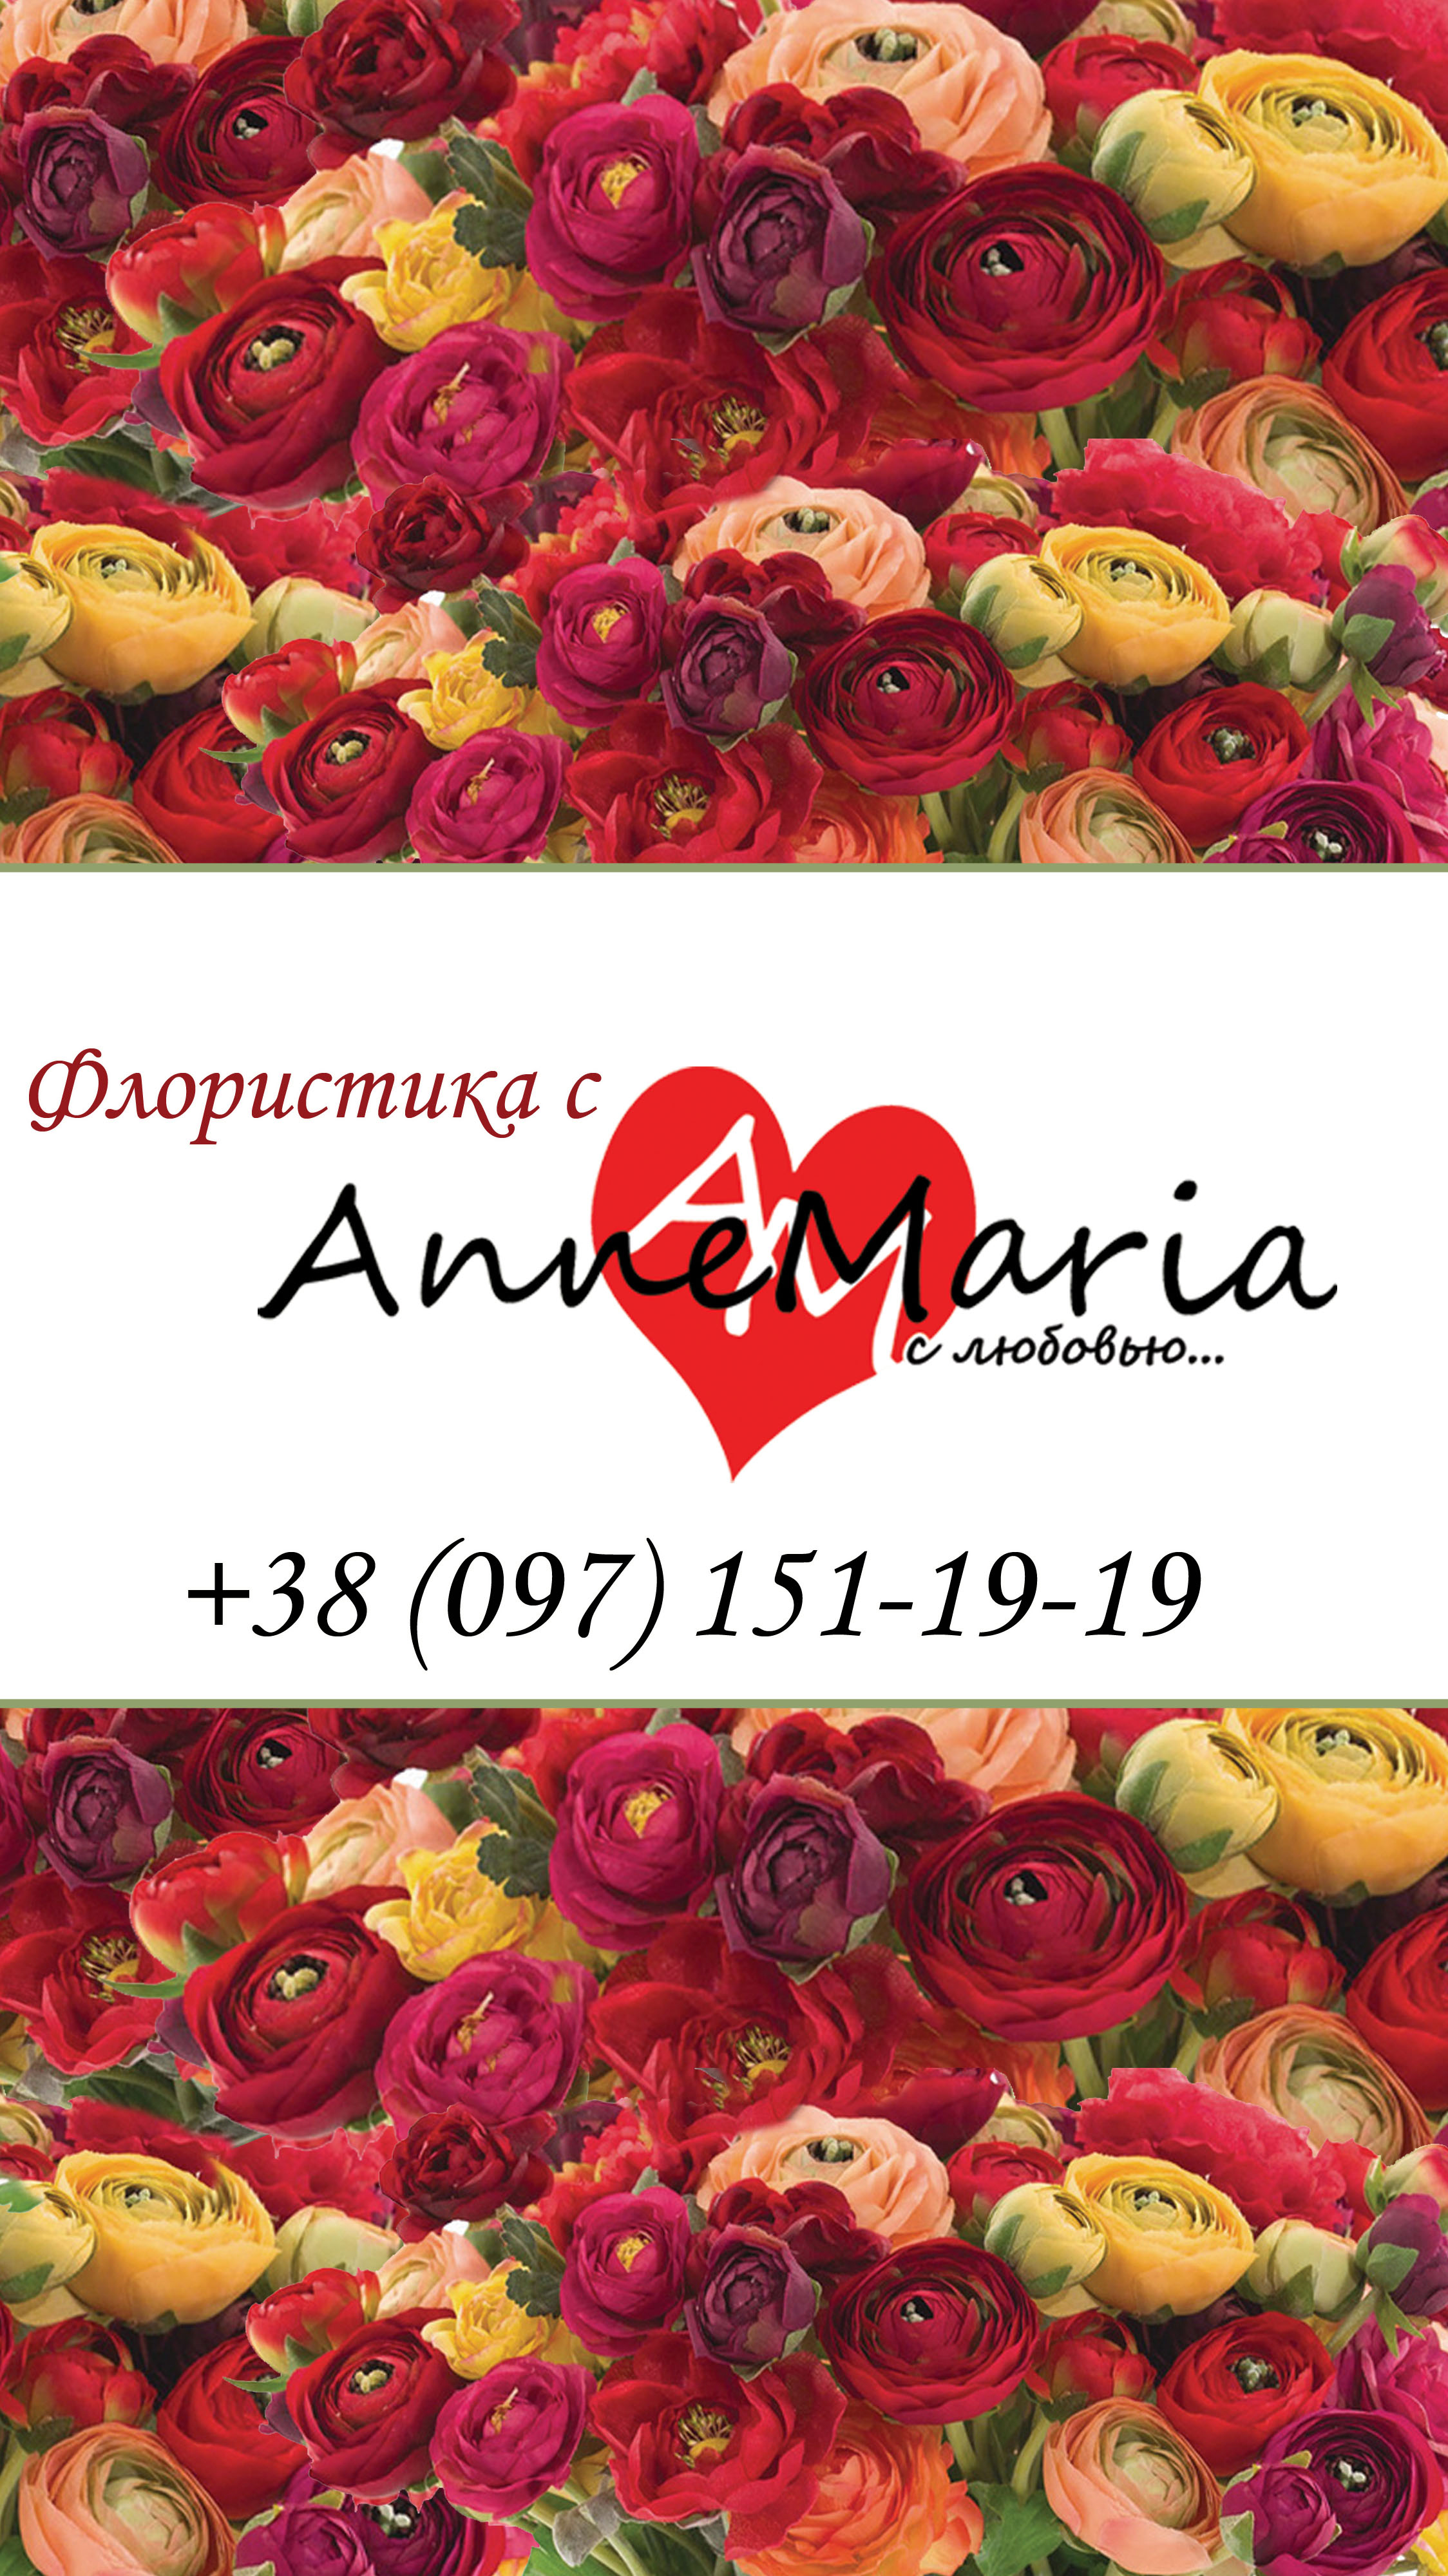 AnneMaria